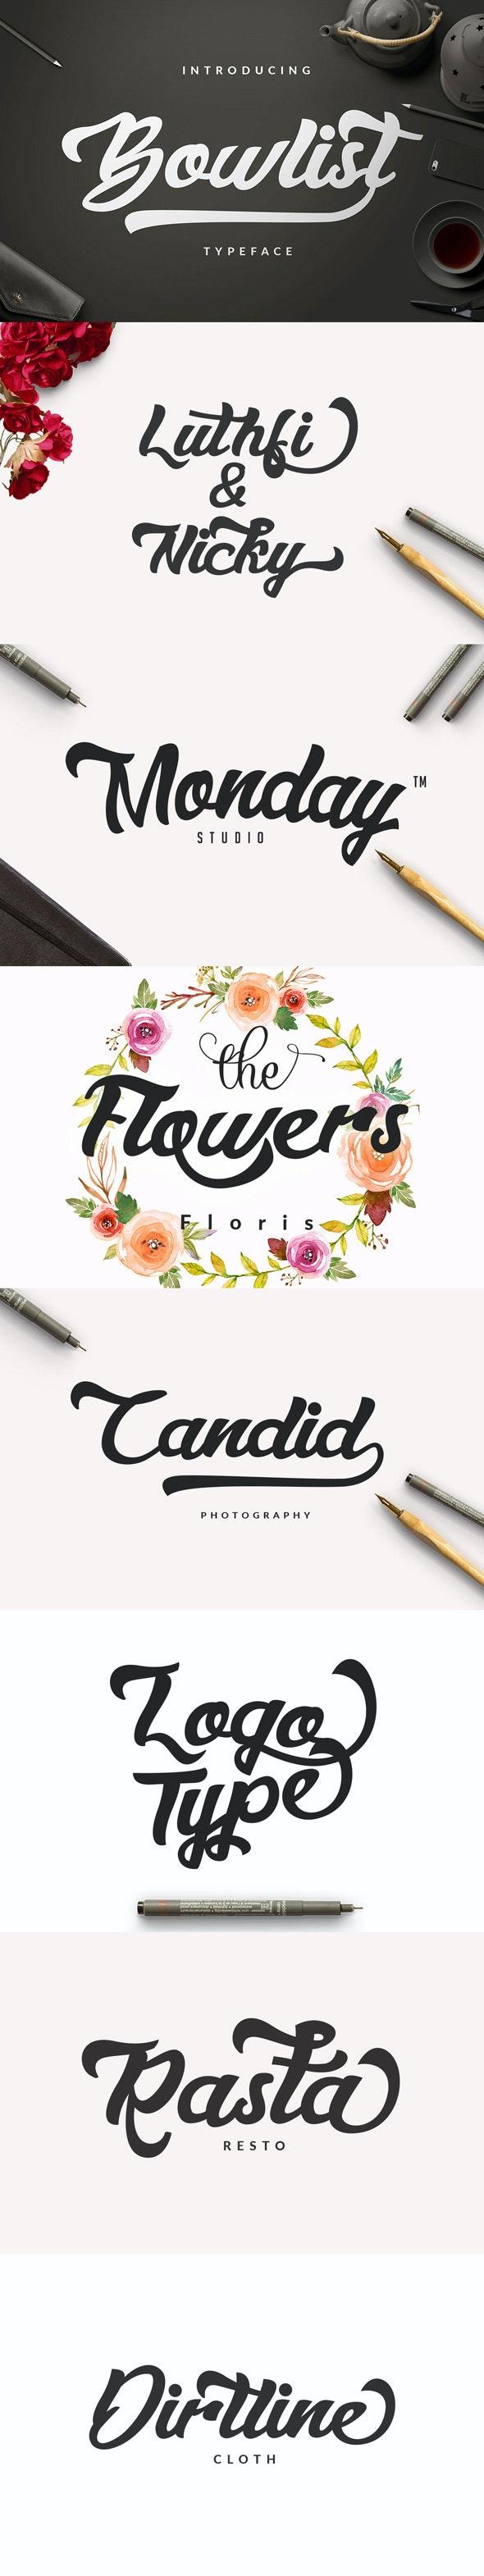 Bowlist - Logo Type  - Calligraphy Script